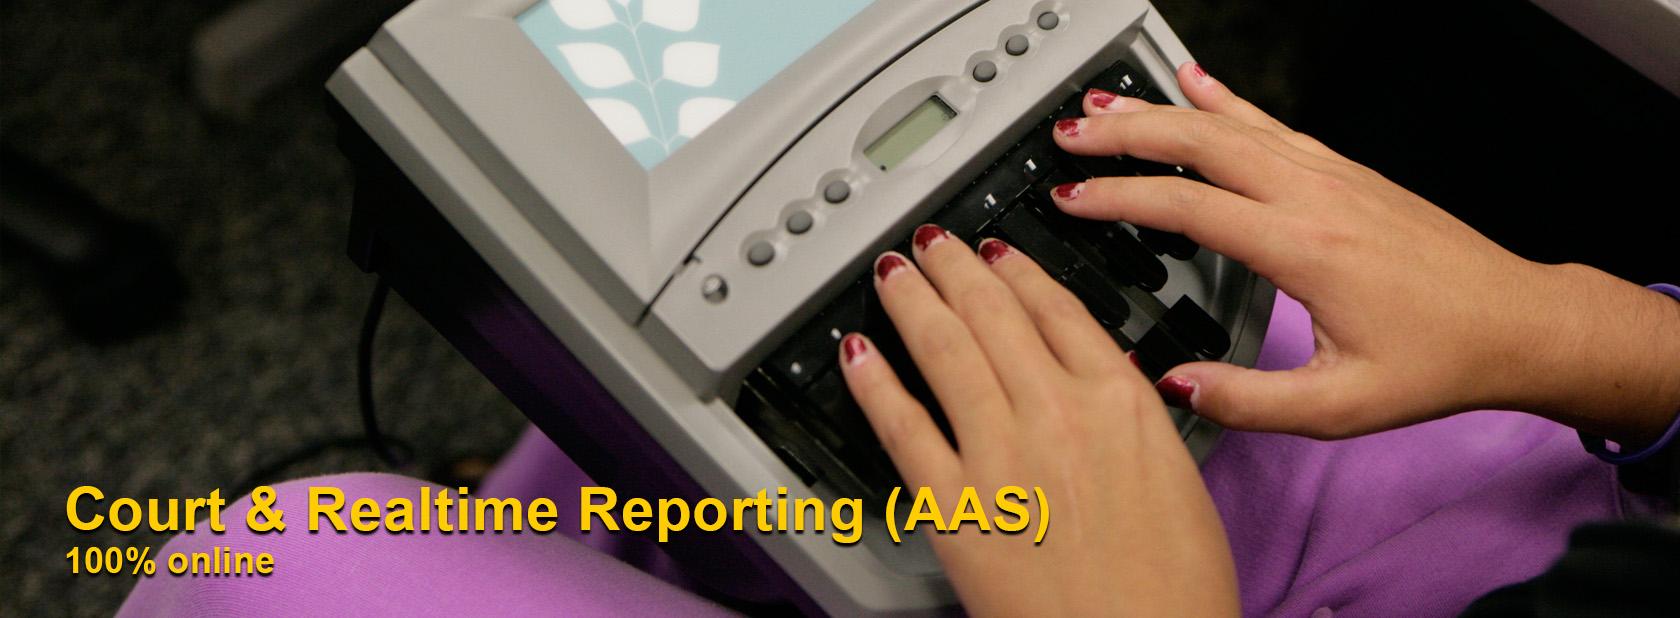 Court Reporting Online.jpg